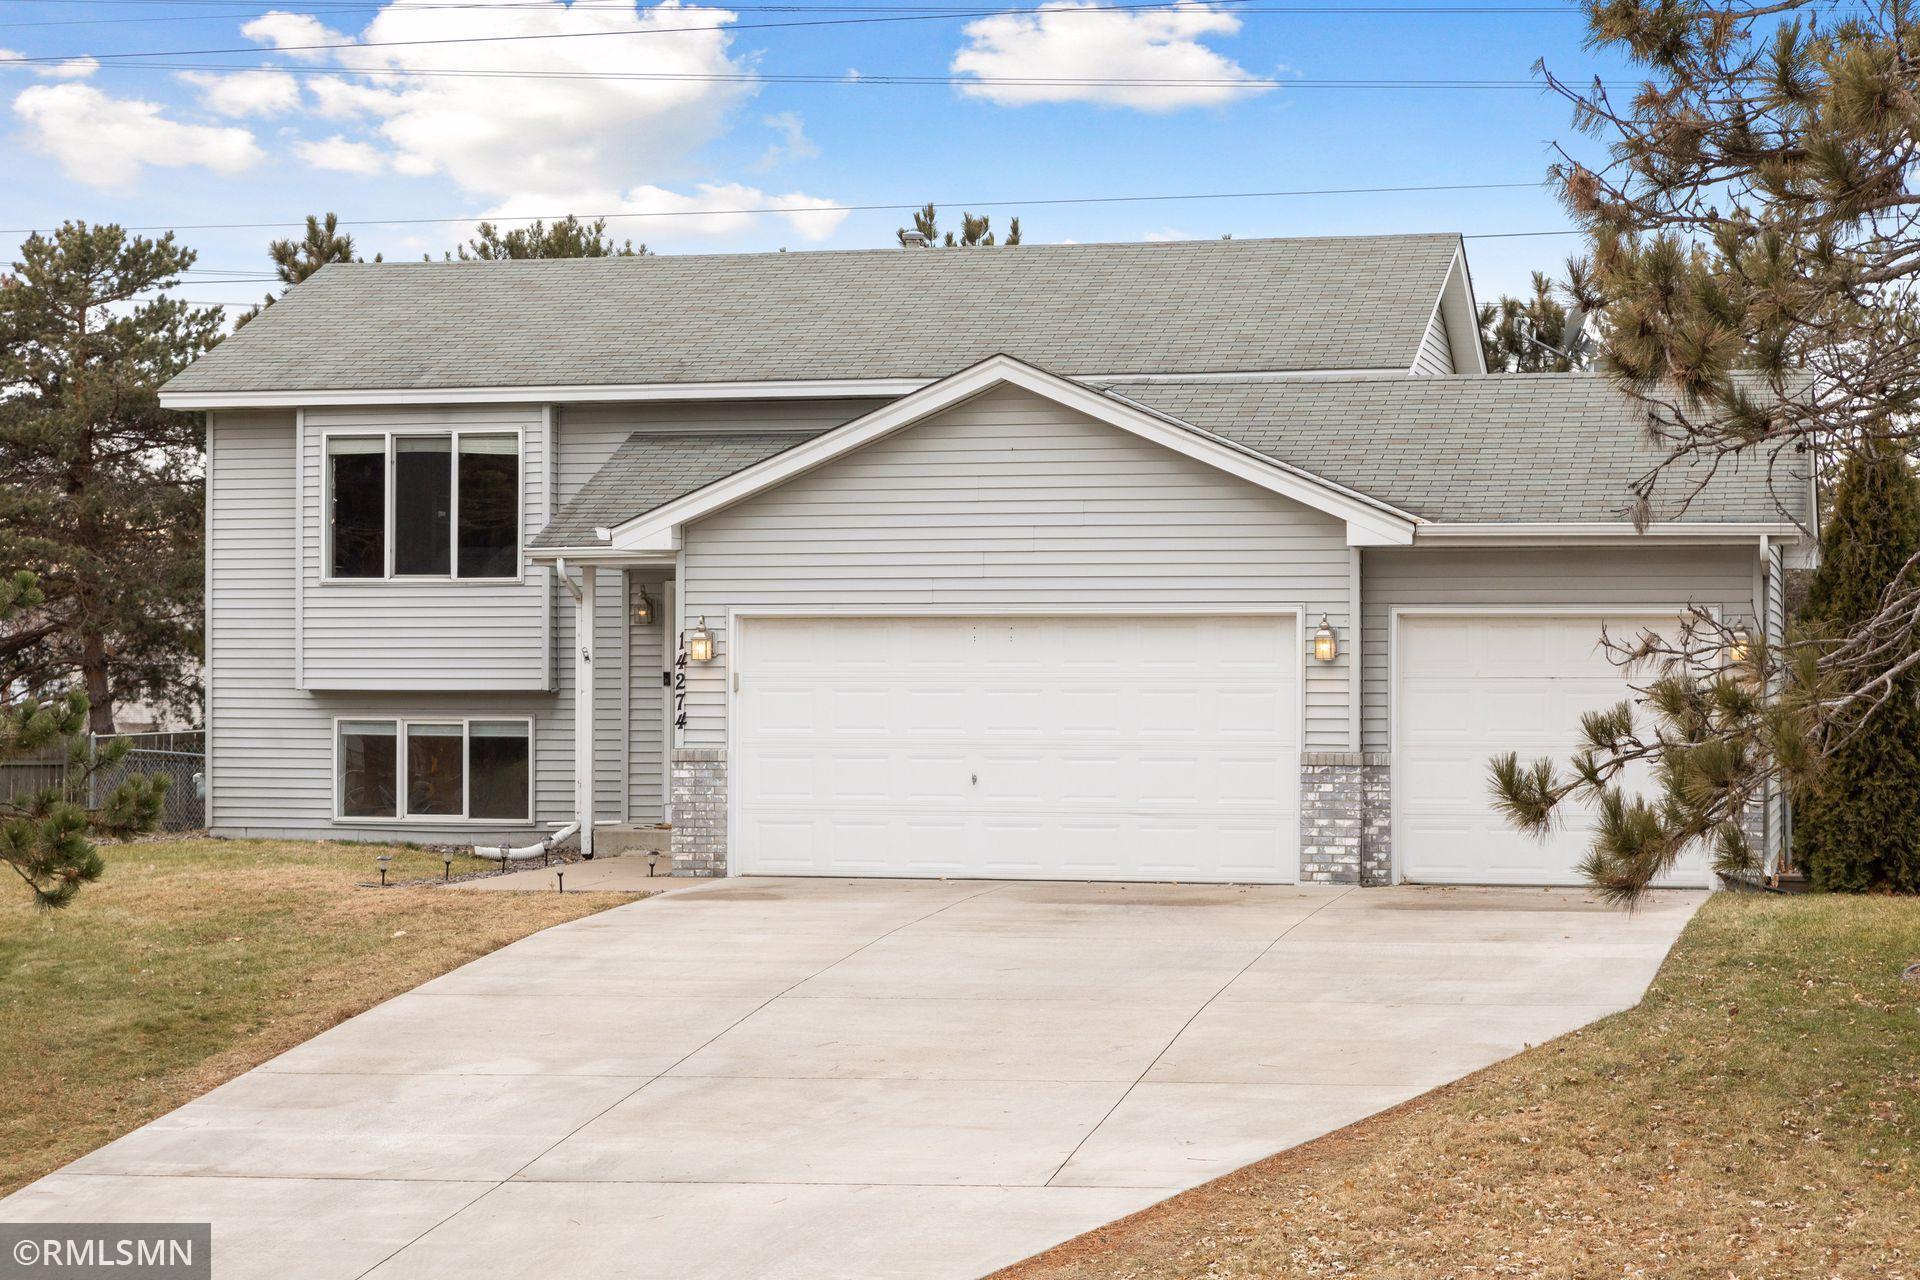 14274 Flamingo Street NW, Andover, MN 55304